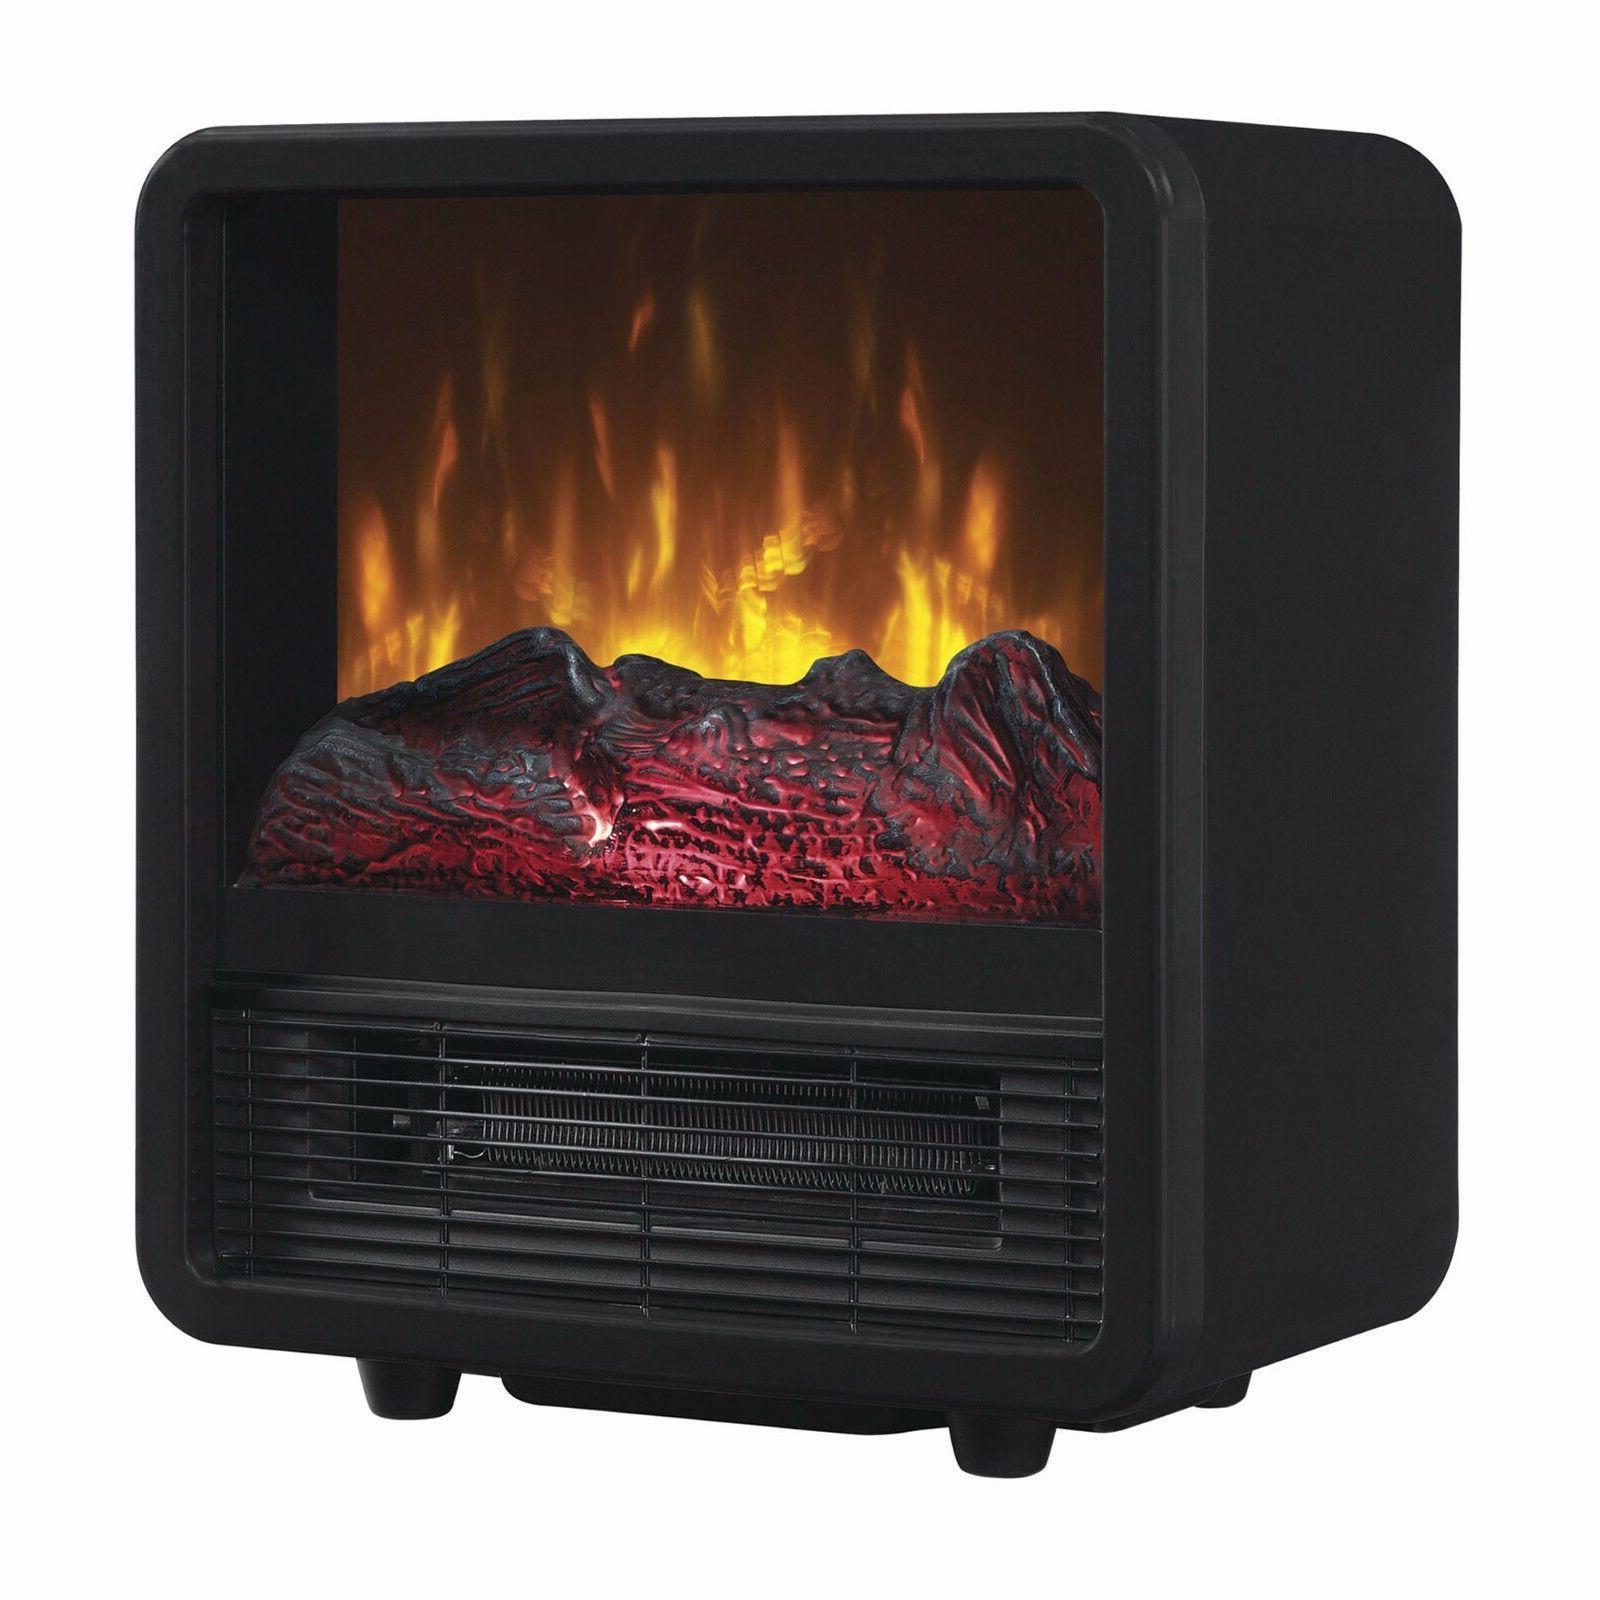 Duraflame 4600 BTU Portable Electric Personal Space Heater C